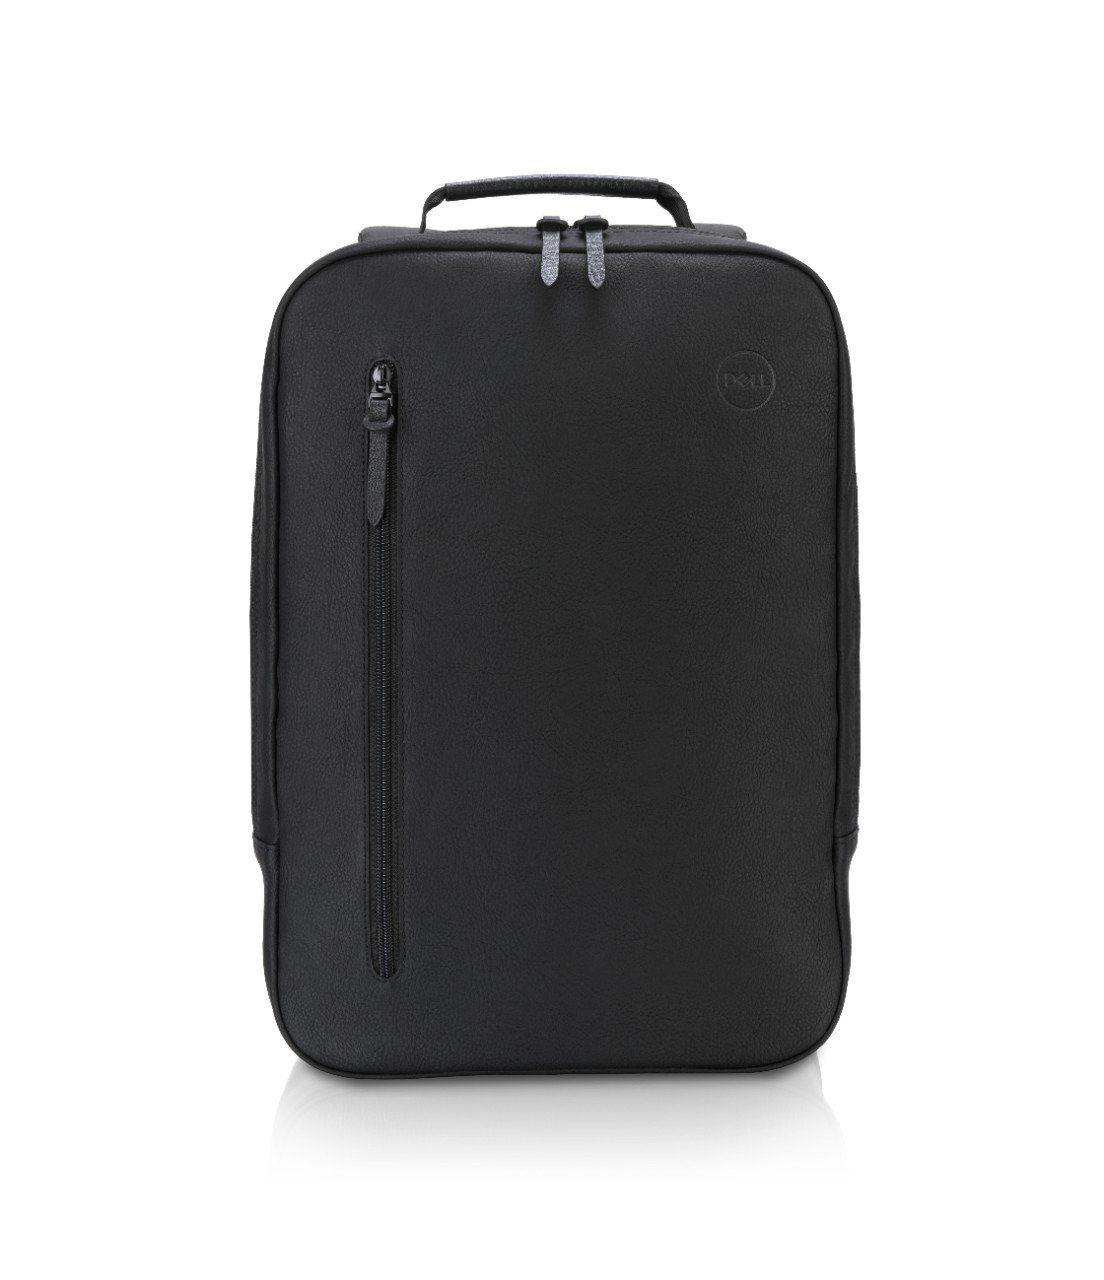 Dell Premier Slim Backpack 14  Amazon.de  Computers   Accessories ... 61997a3bf5414